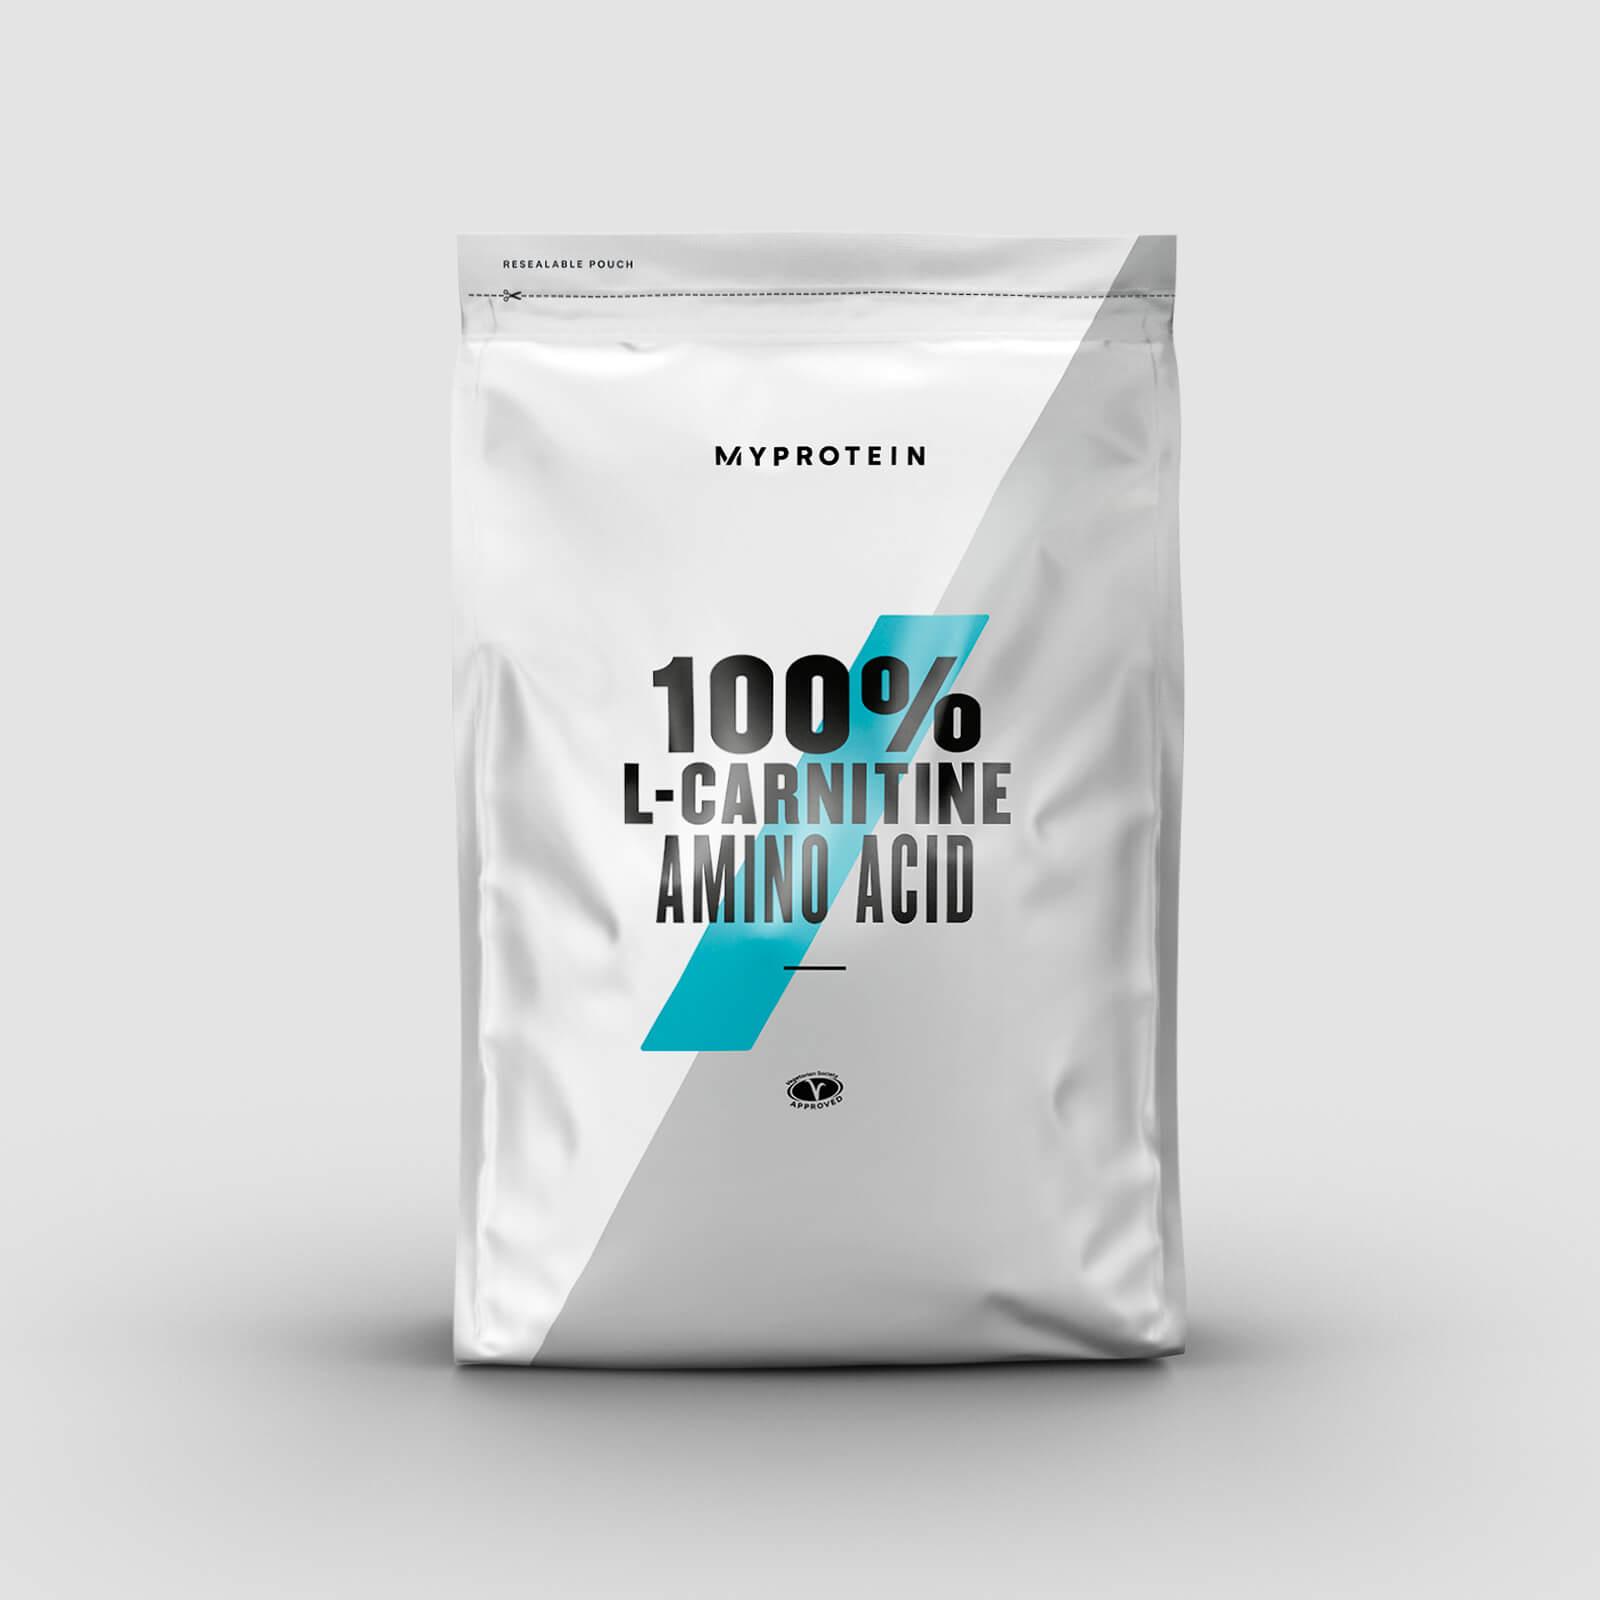 Myprotein 100% L-Καρνιτίνη αμινοξύ - 500g - Χωρίς Γεύση